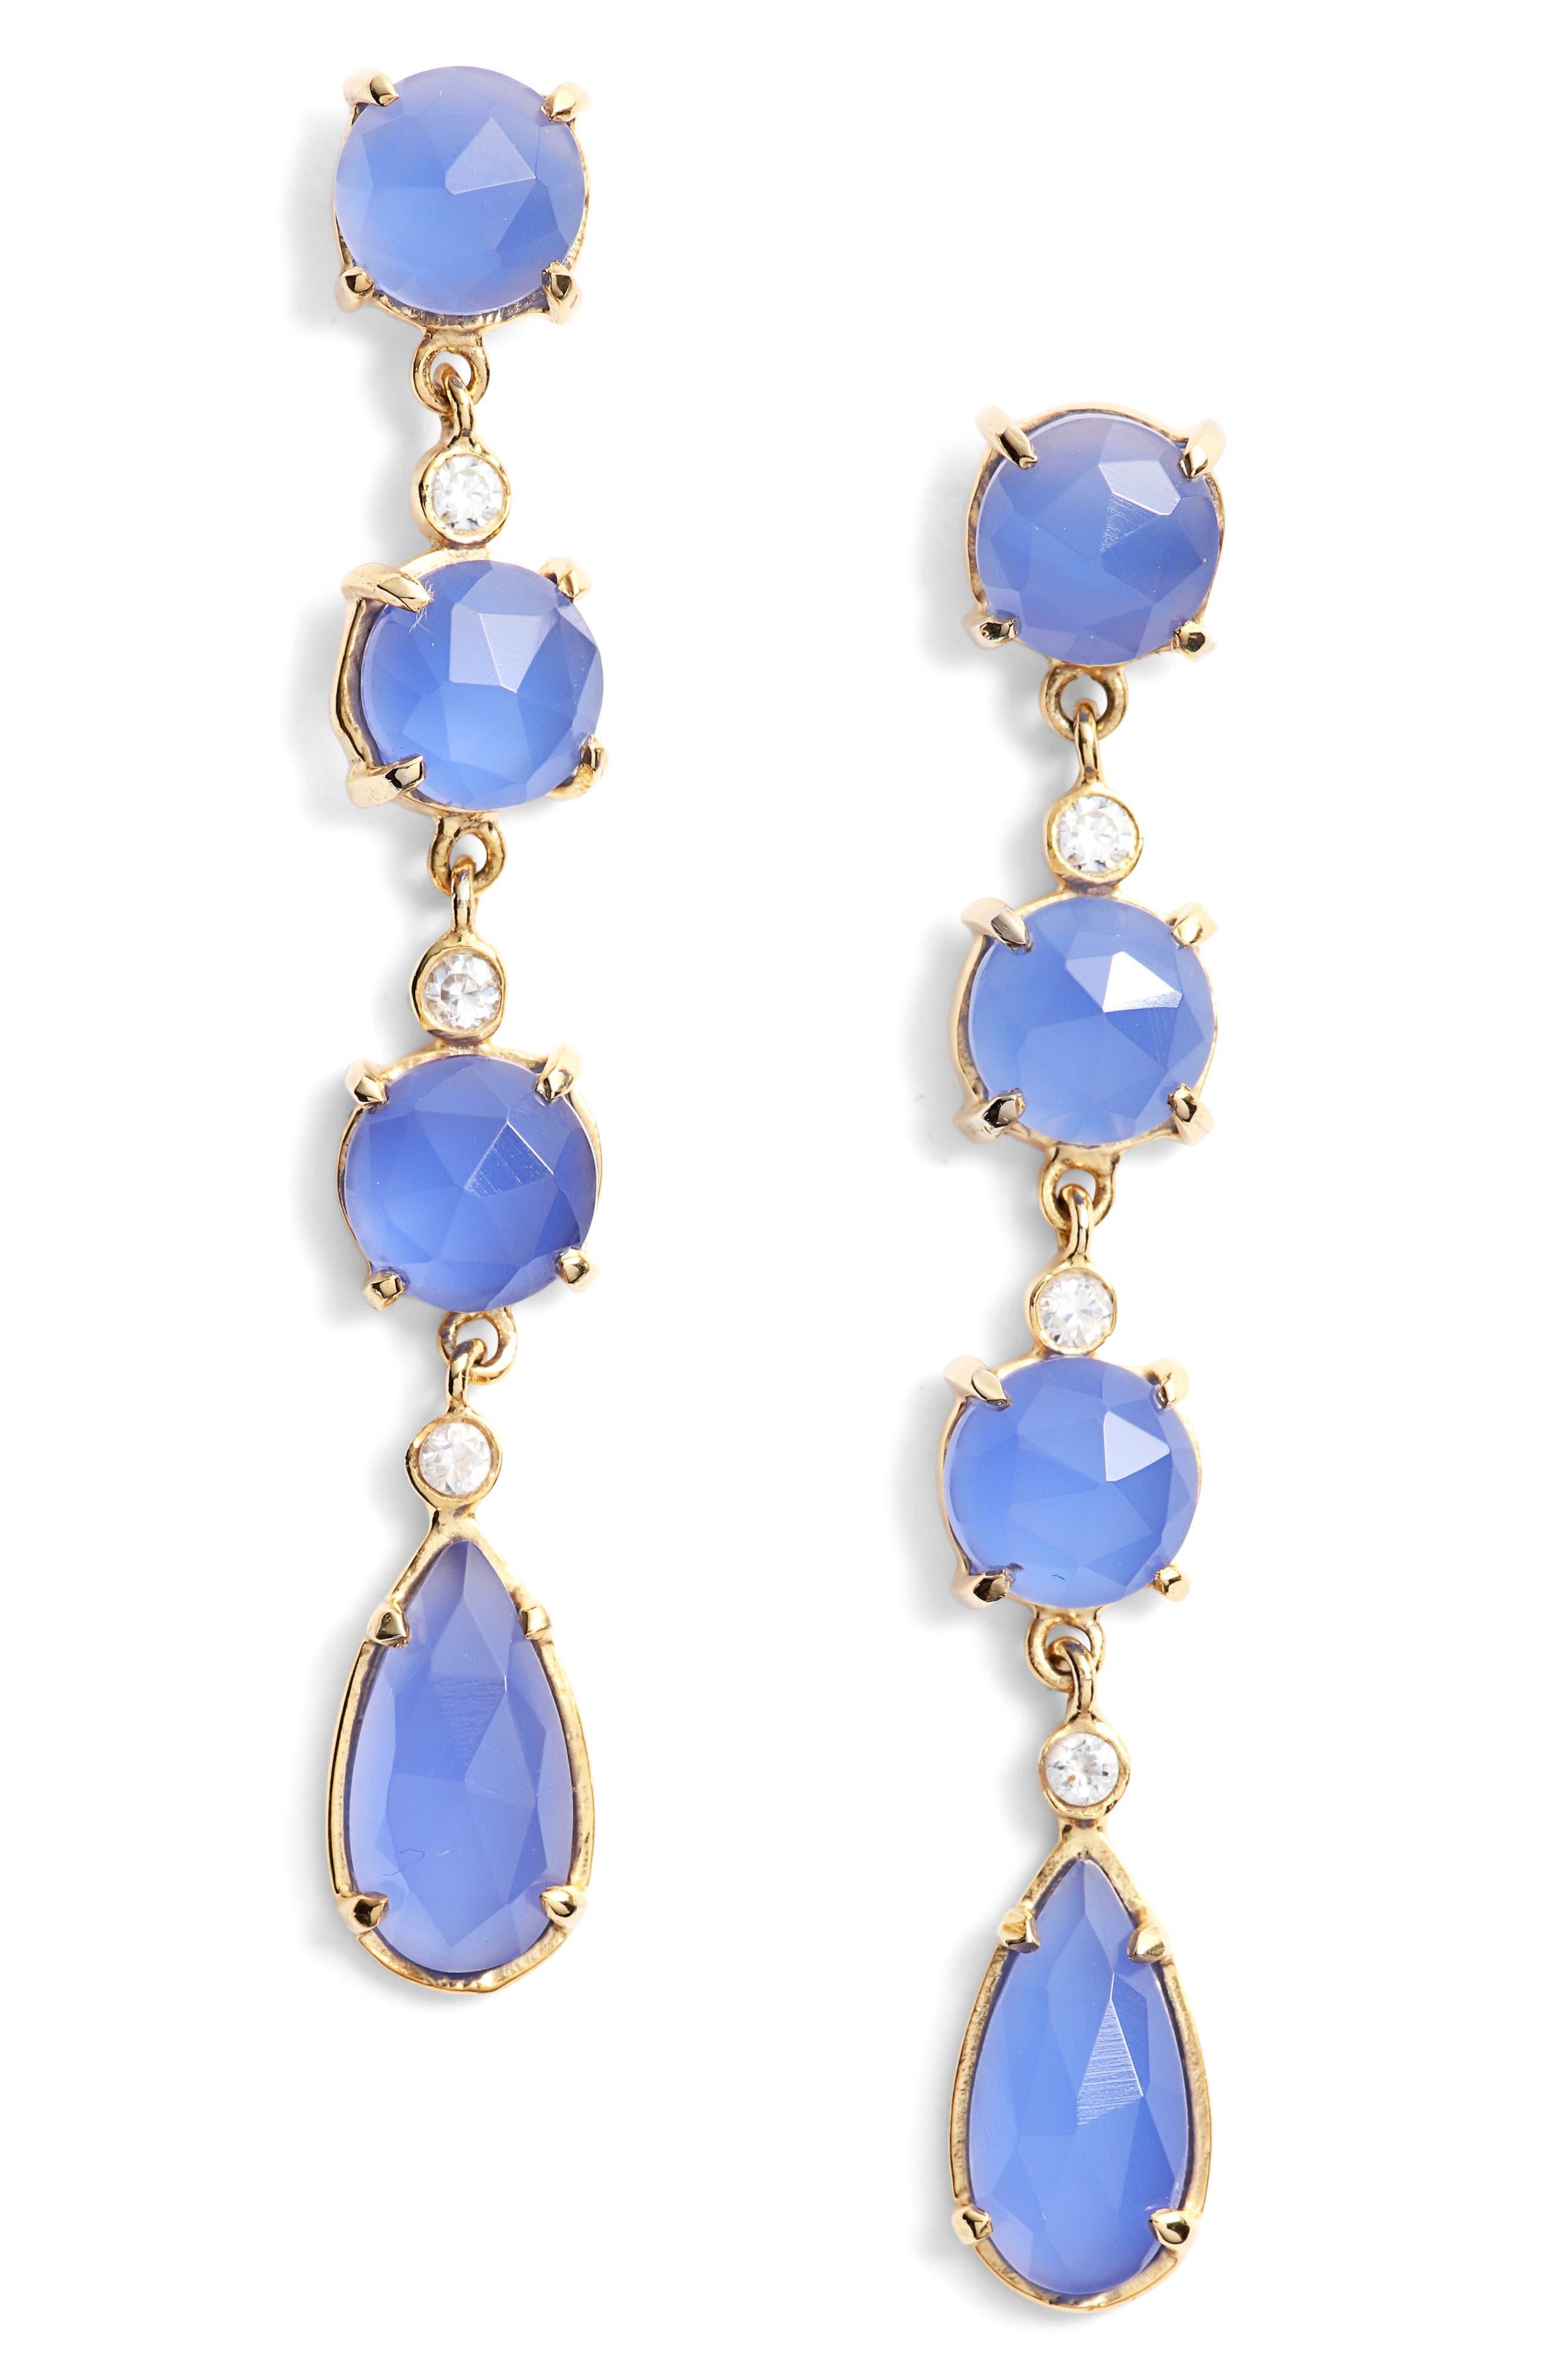 Stone Linear Drop Earrings,                             Main thumbnail 1, color,                             IOLITE/ GOLD